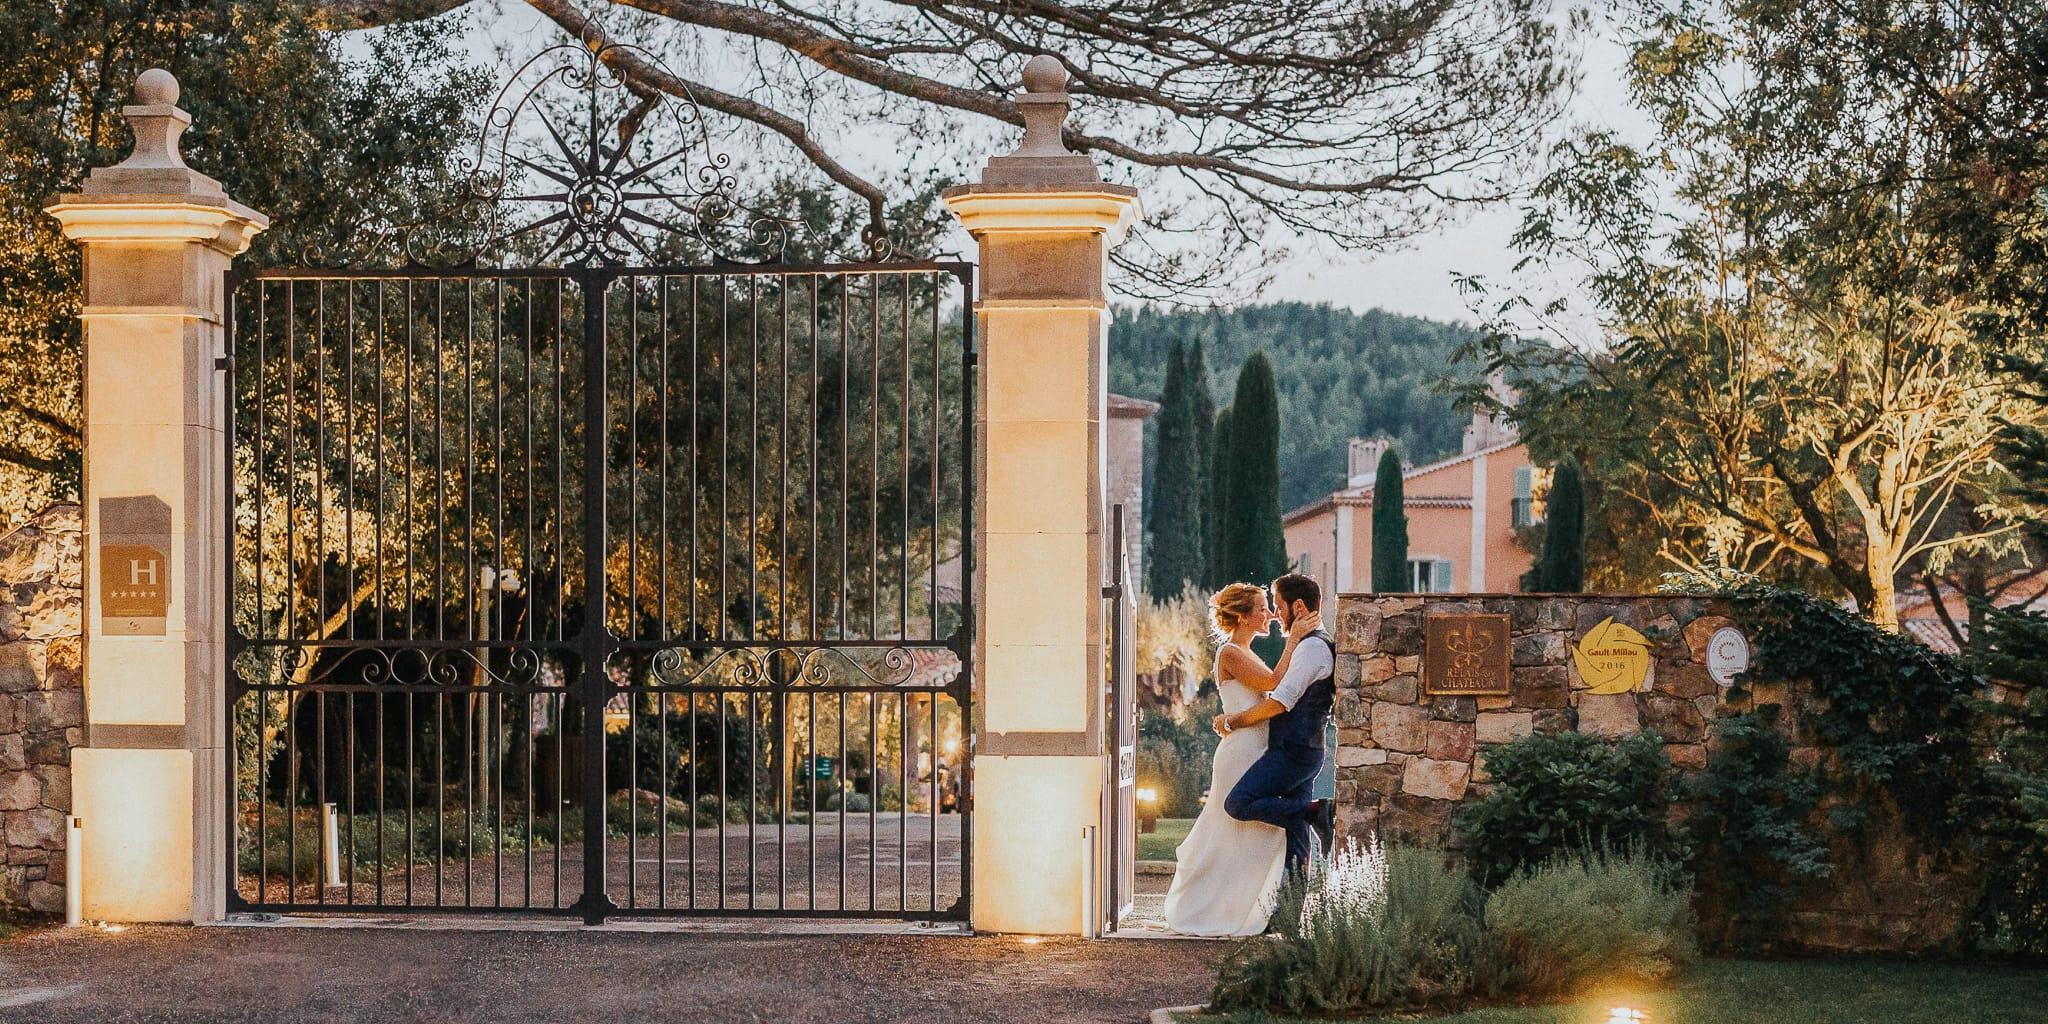 Costi-Moiceanu-Photographer-CM-Photography-Wedding-Mariage-French-Riviera-Cote-D-Azur-Alpes-Maritimes-Weding-Album-Design-18